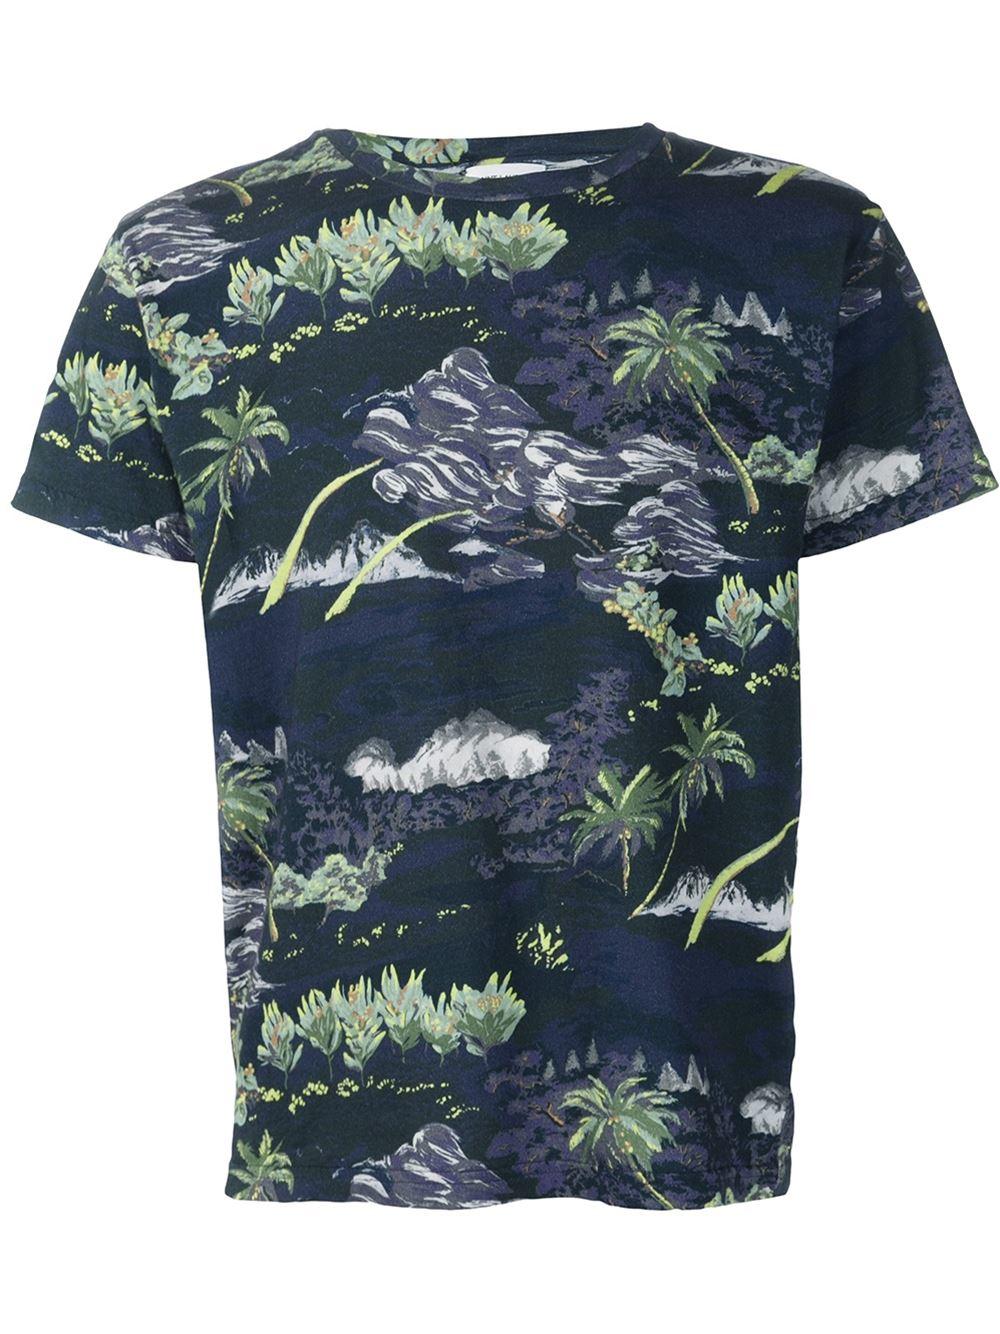 Saint laurent hawaii print t shirt in multicolor for men for T shirt printing hawaii